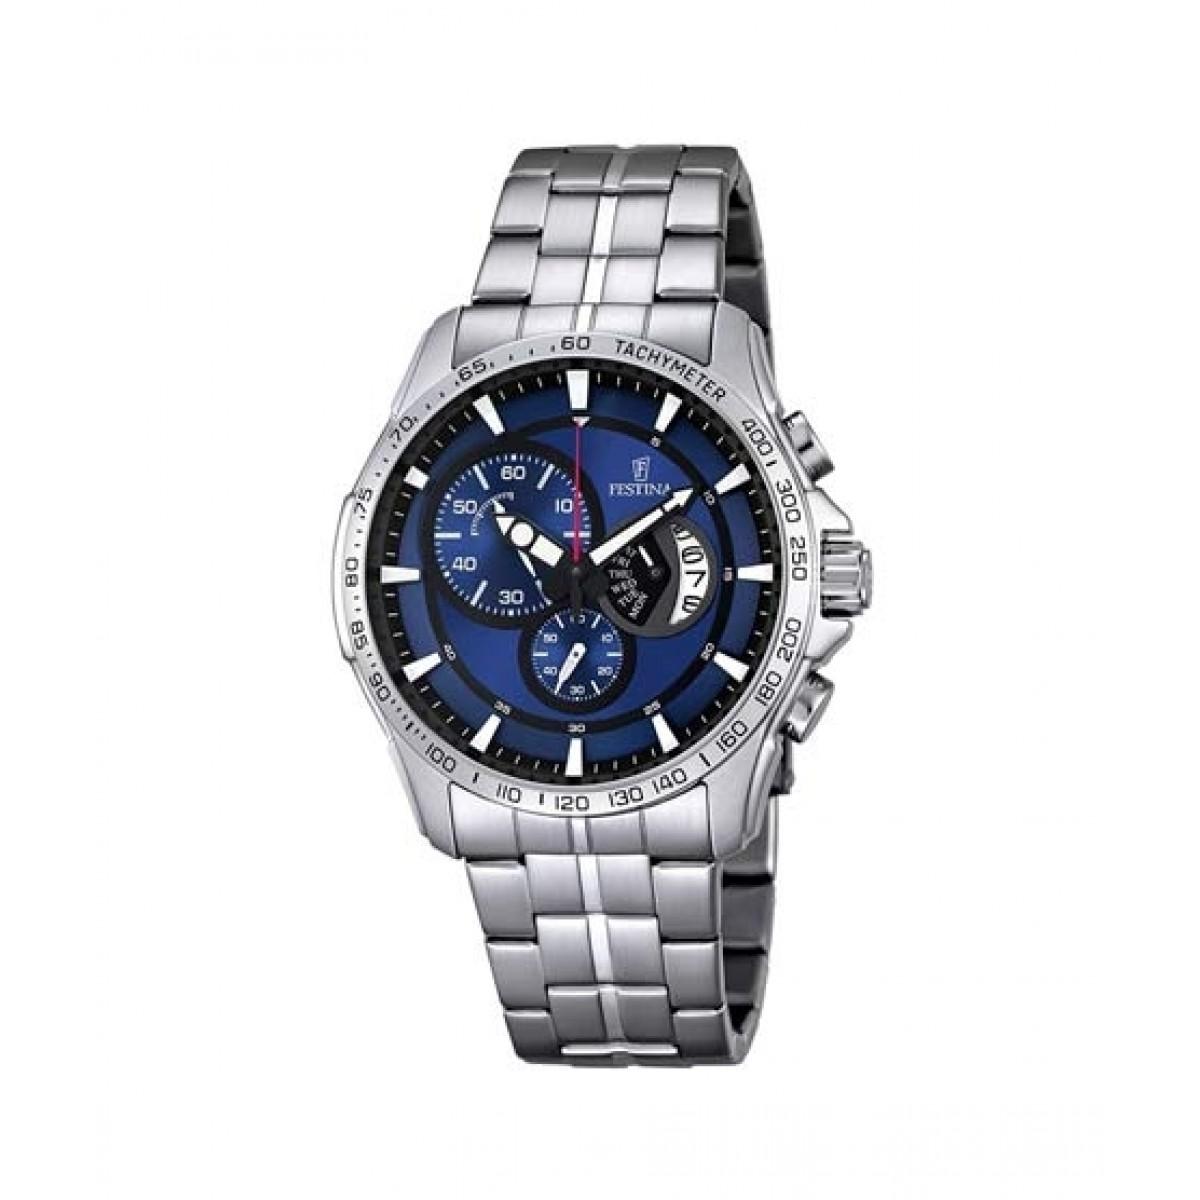 Festina Stainless Steel Men's Watch (F6849/3) Price in Pakistan | Buy  Festina Chronograph Men's Watch Silver (F6849/3) | iShopping.pk